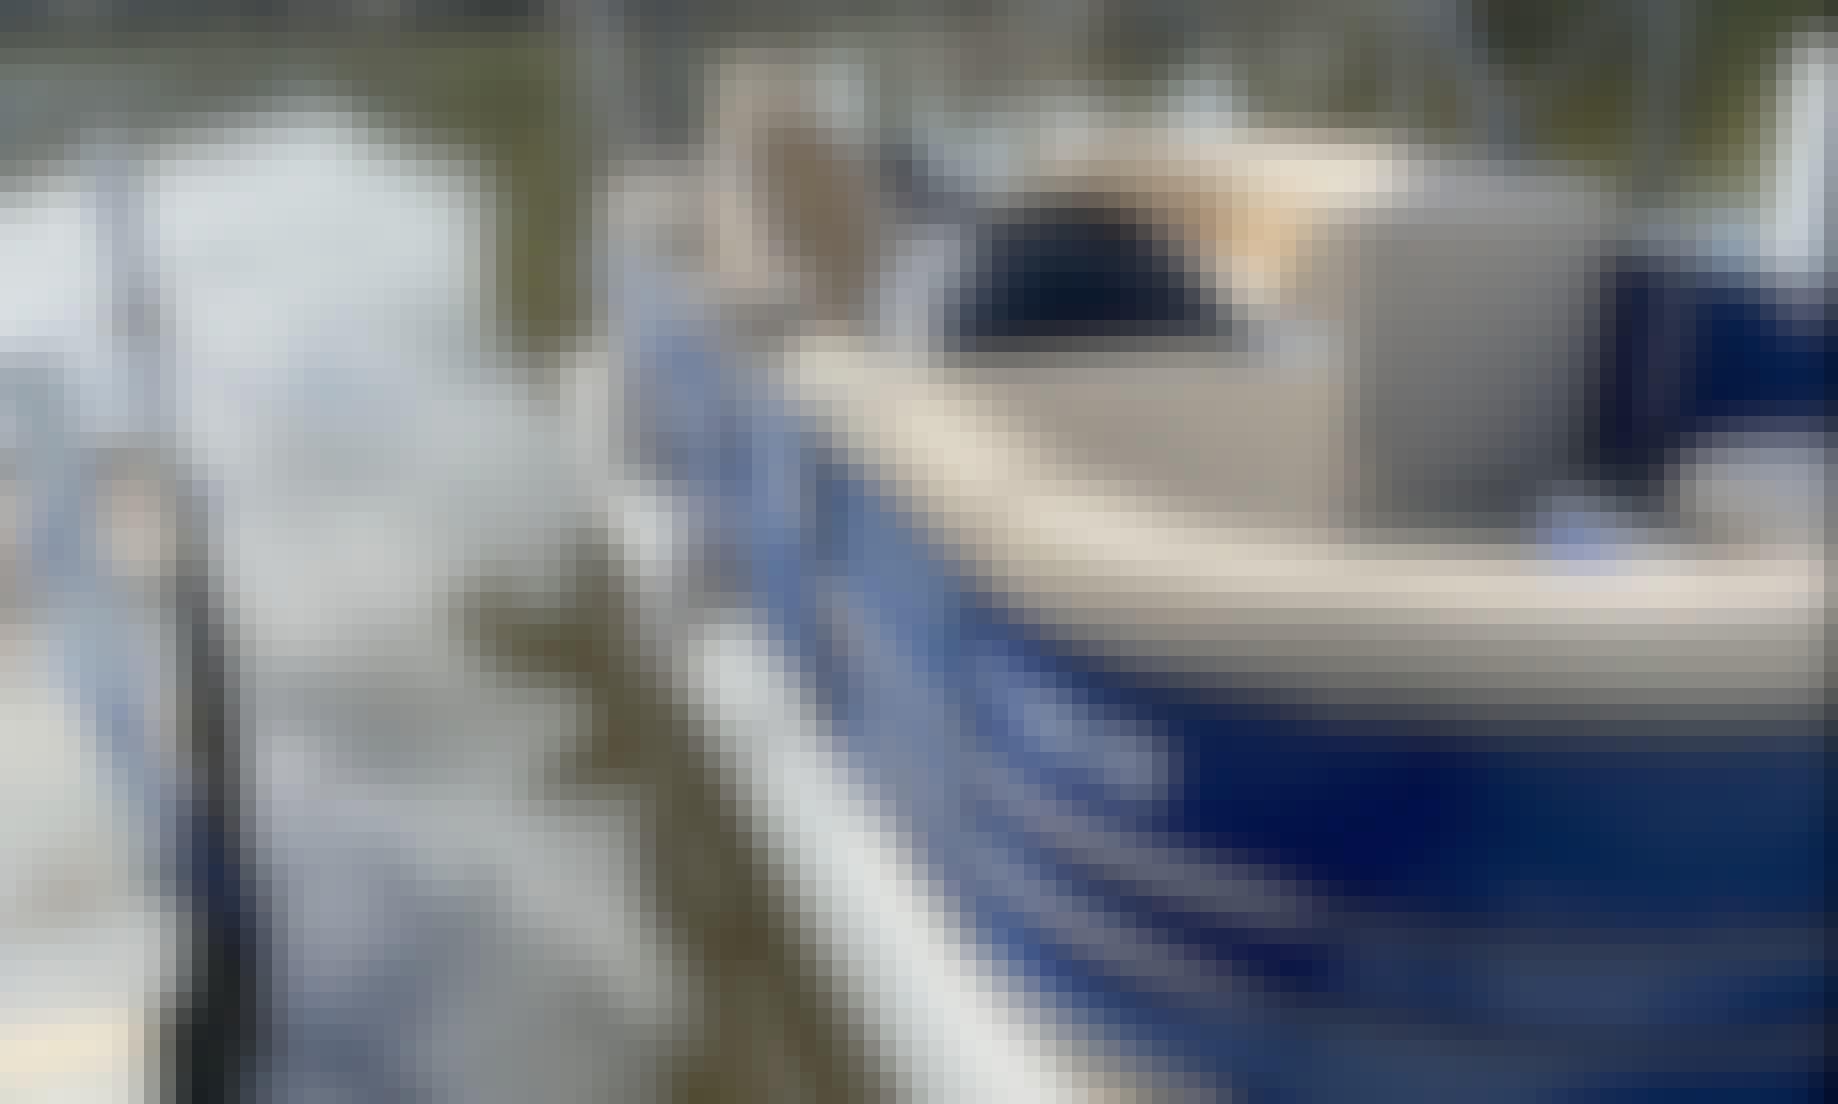 Fun Lexington Pontoon Boats from Naples Florida to Keewaydin Island